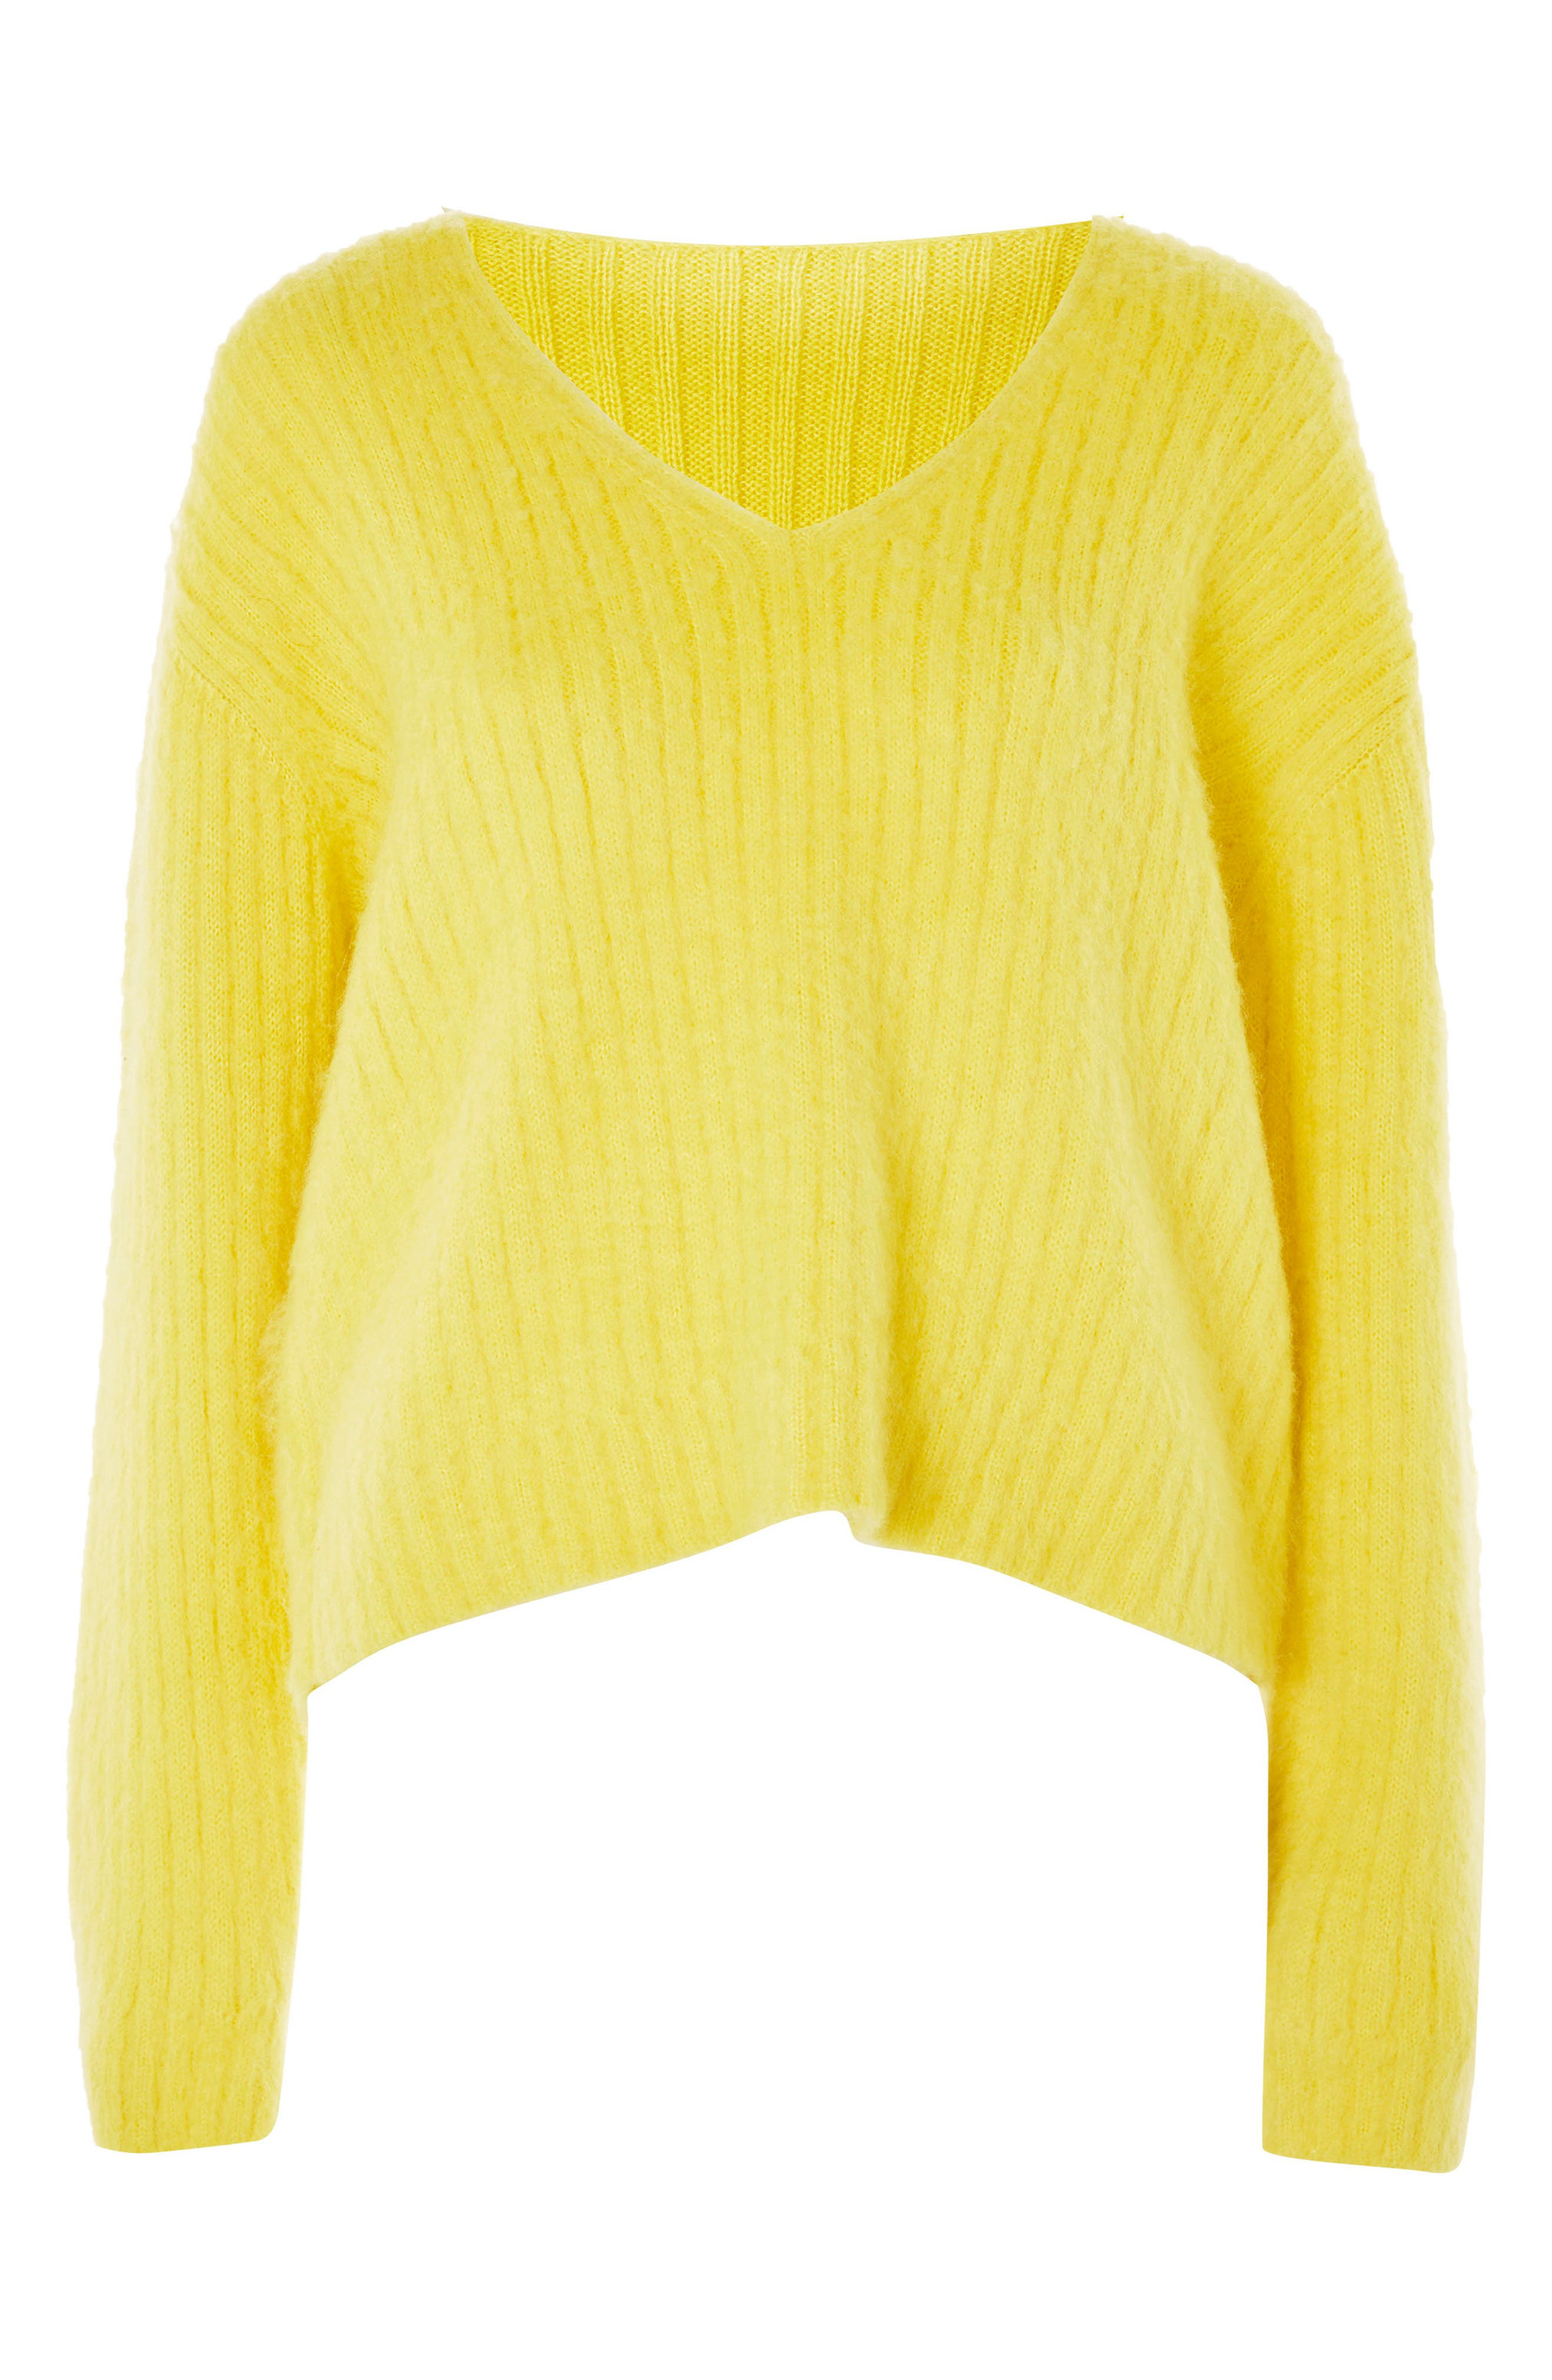 Alternate Image 1 Selected - Topshop Boutique V-Neck Rib Sweater